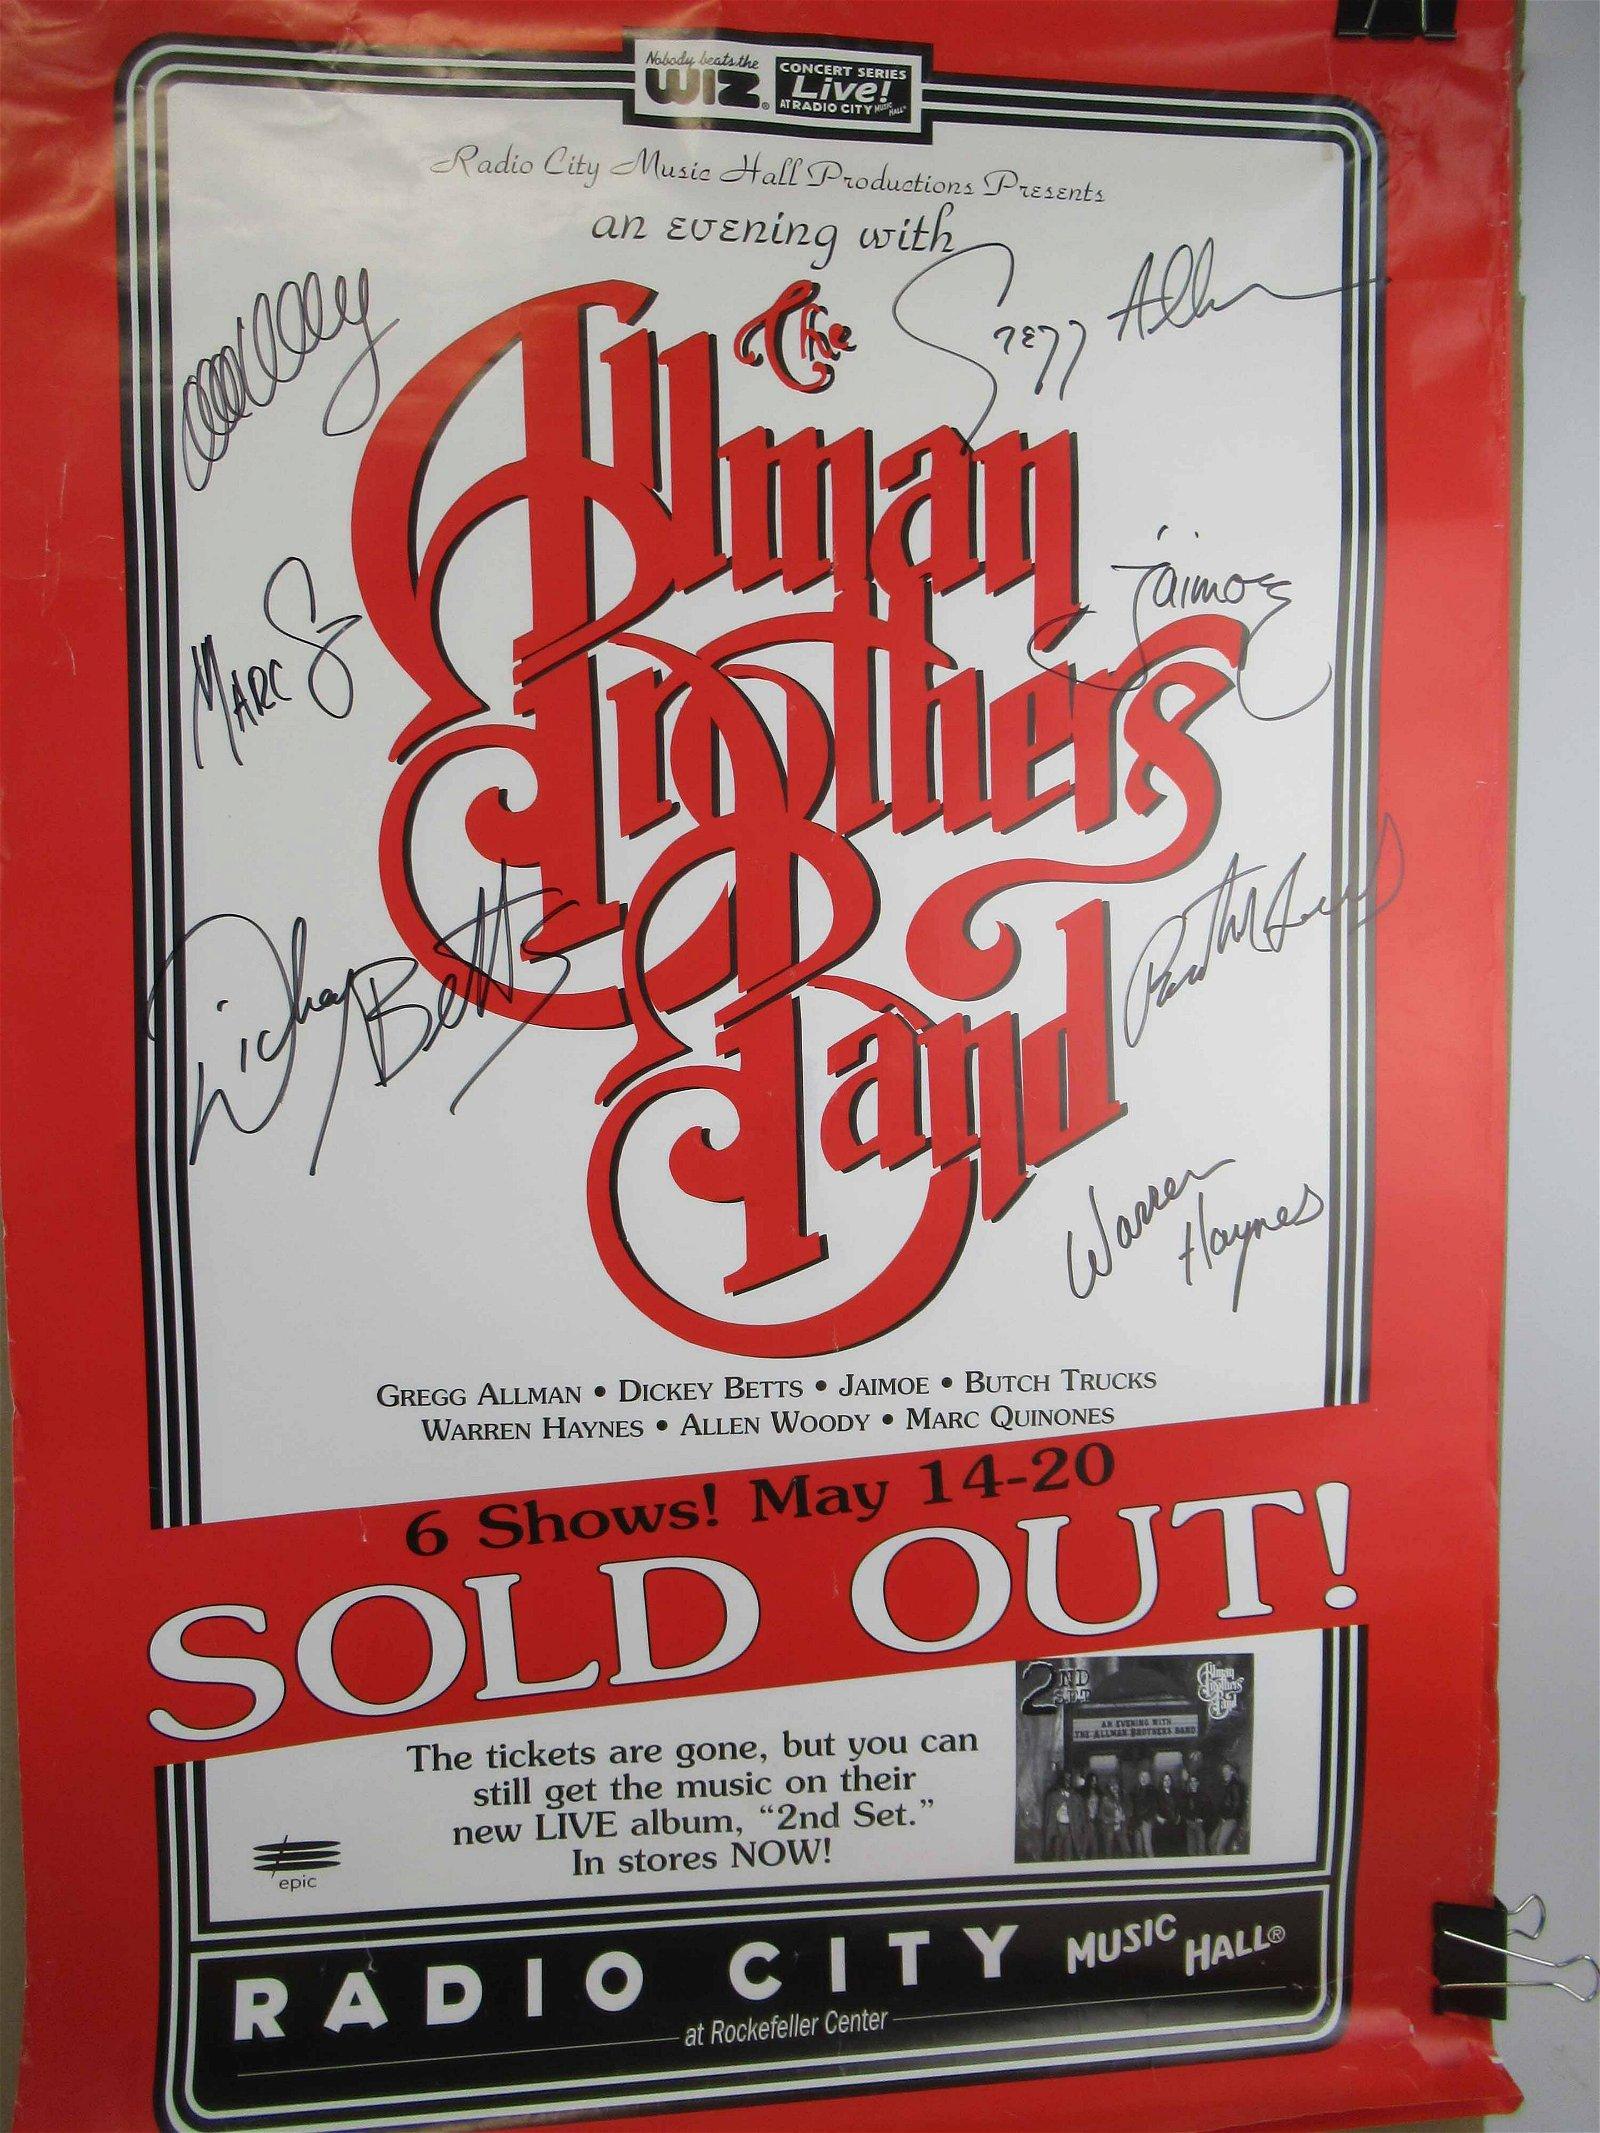 Three Radio City Music Hall Concert Posters